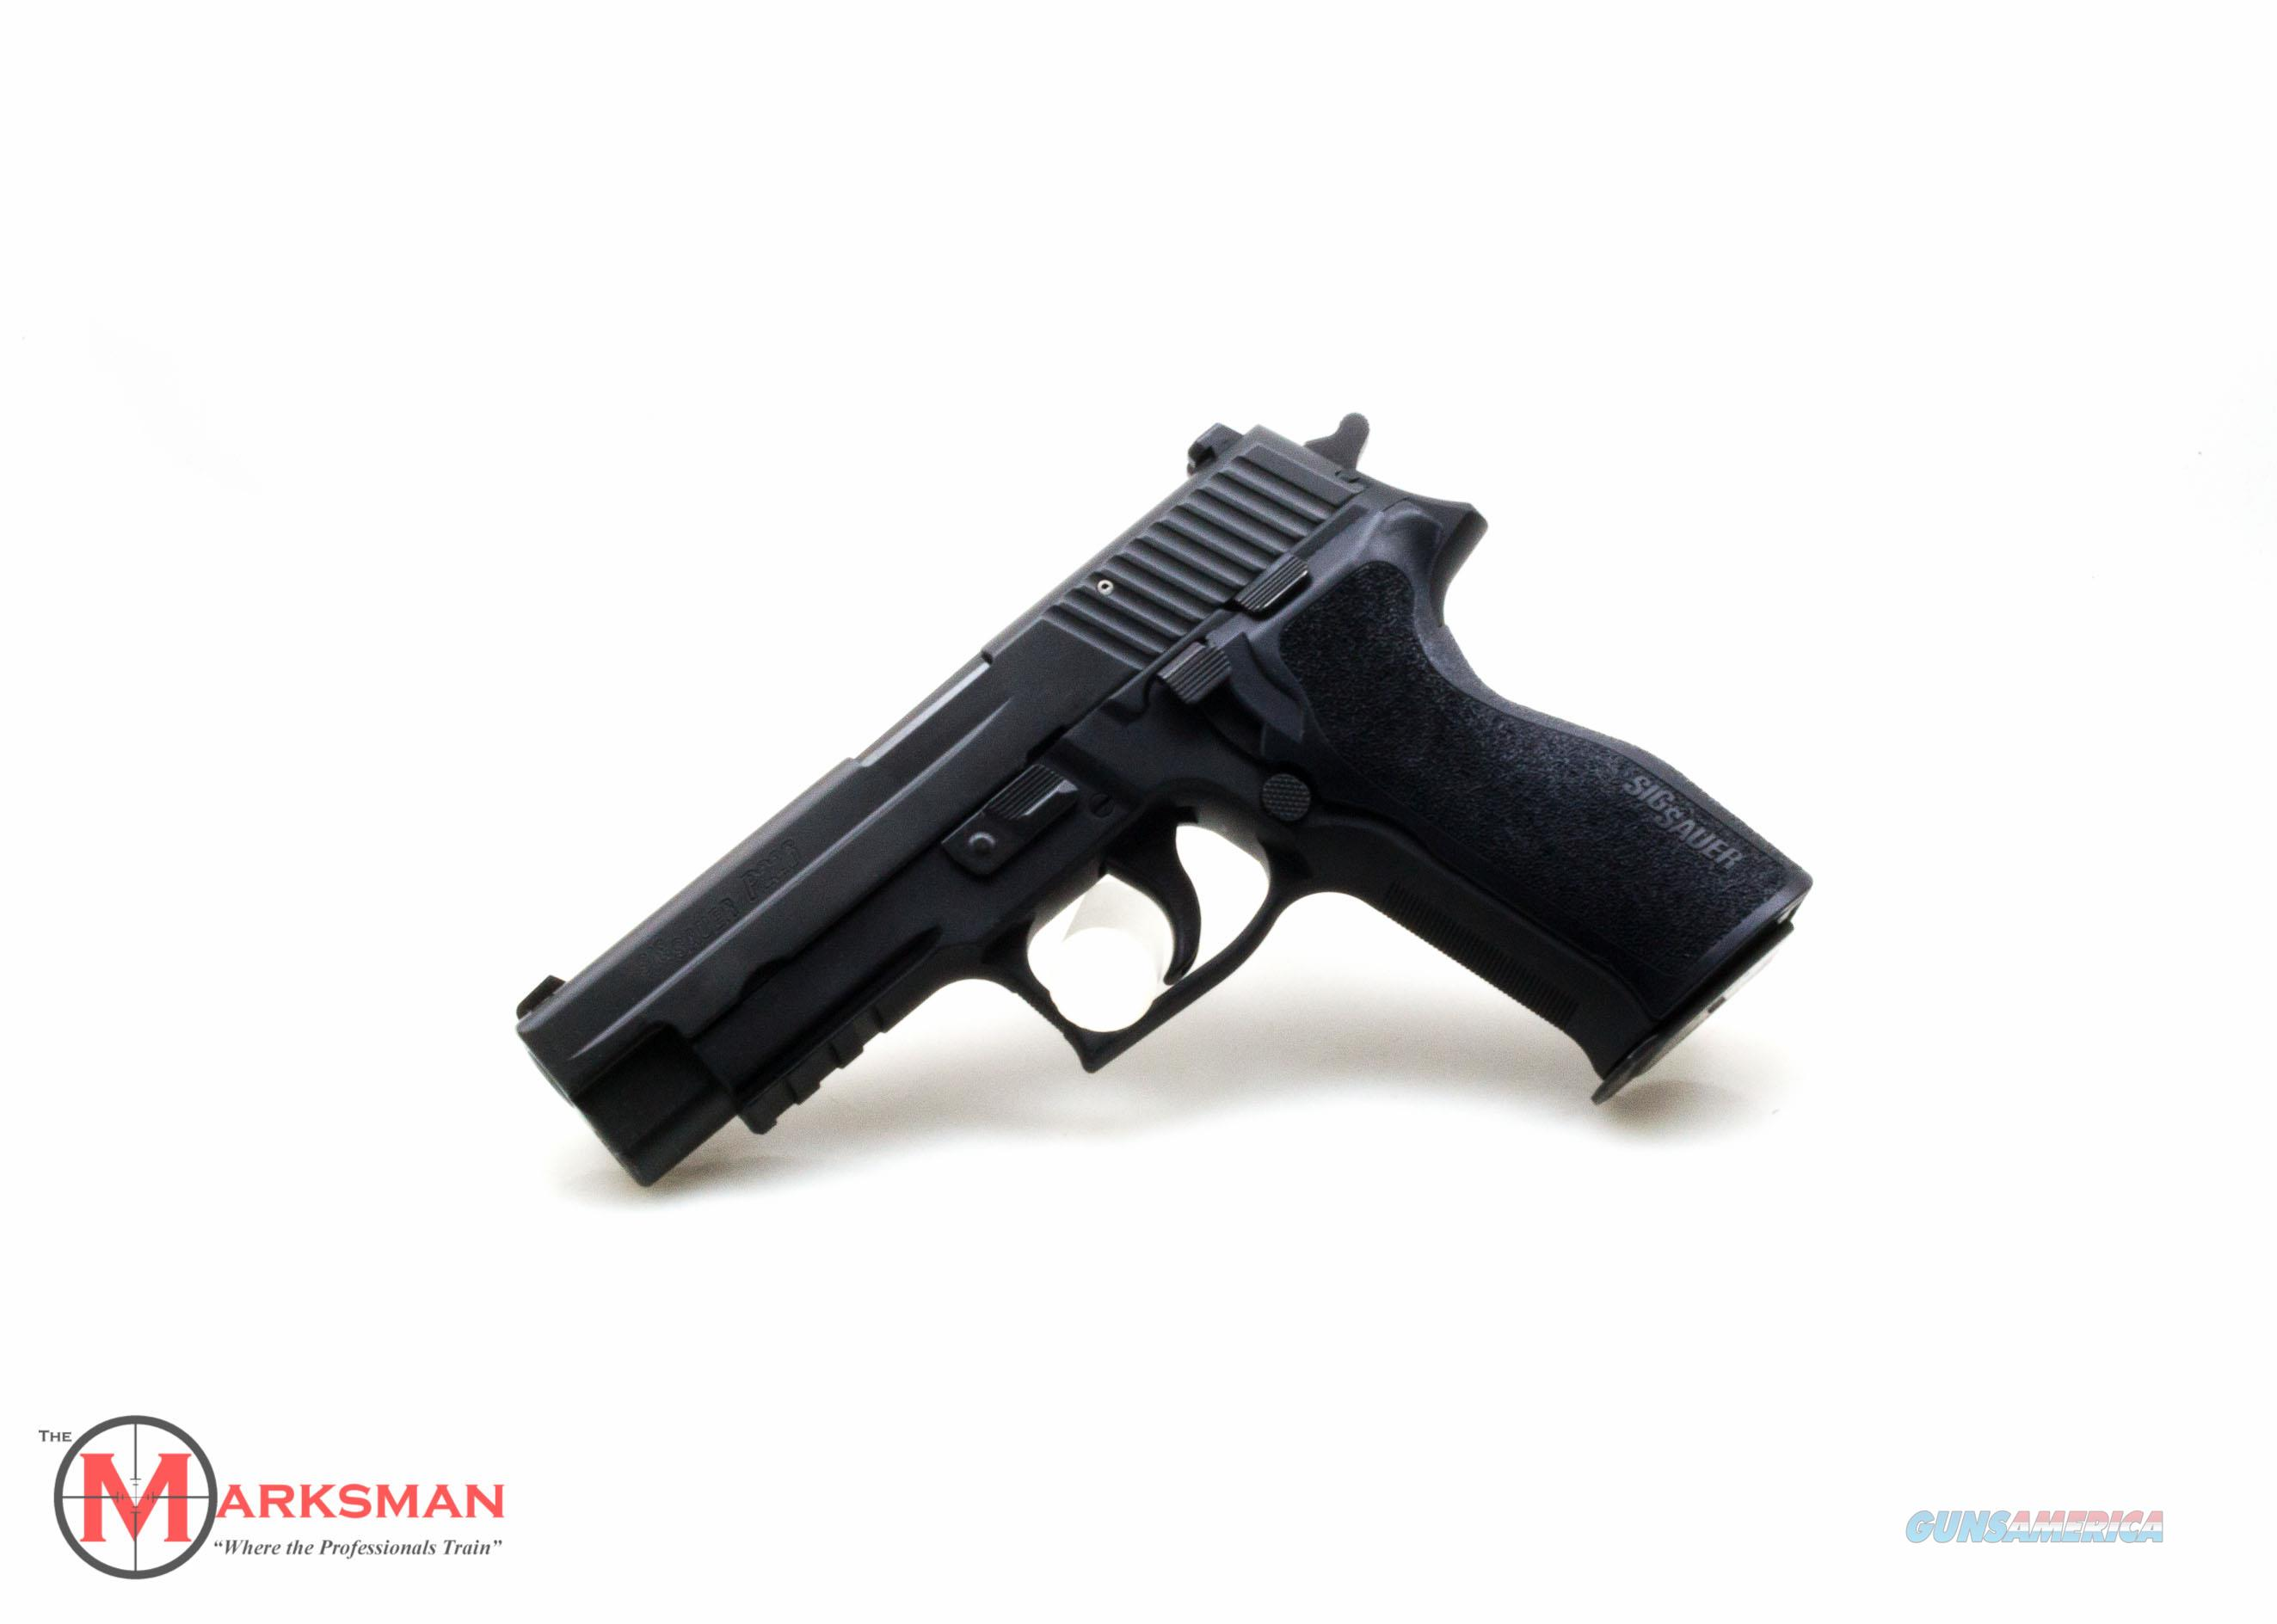 Sig Sauer P226 .40 S&W NEW Night Sights  Guns > Pistols > Sig - Sauer/Sigarms Pistols > P226